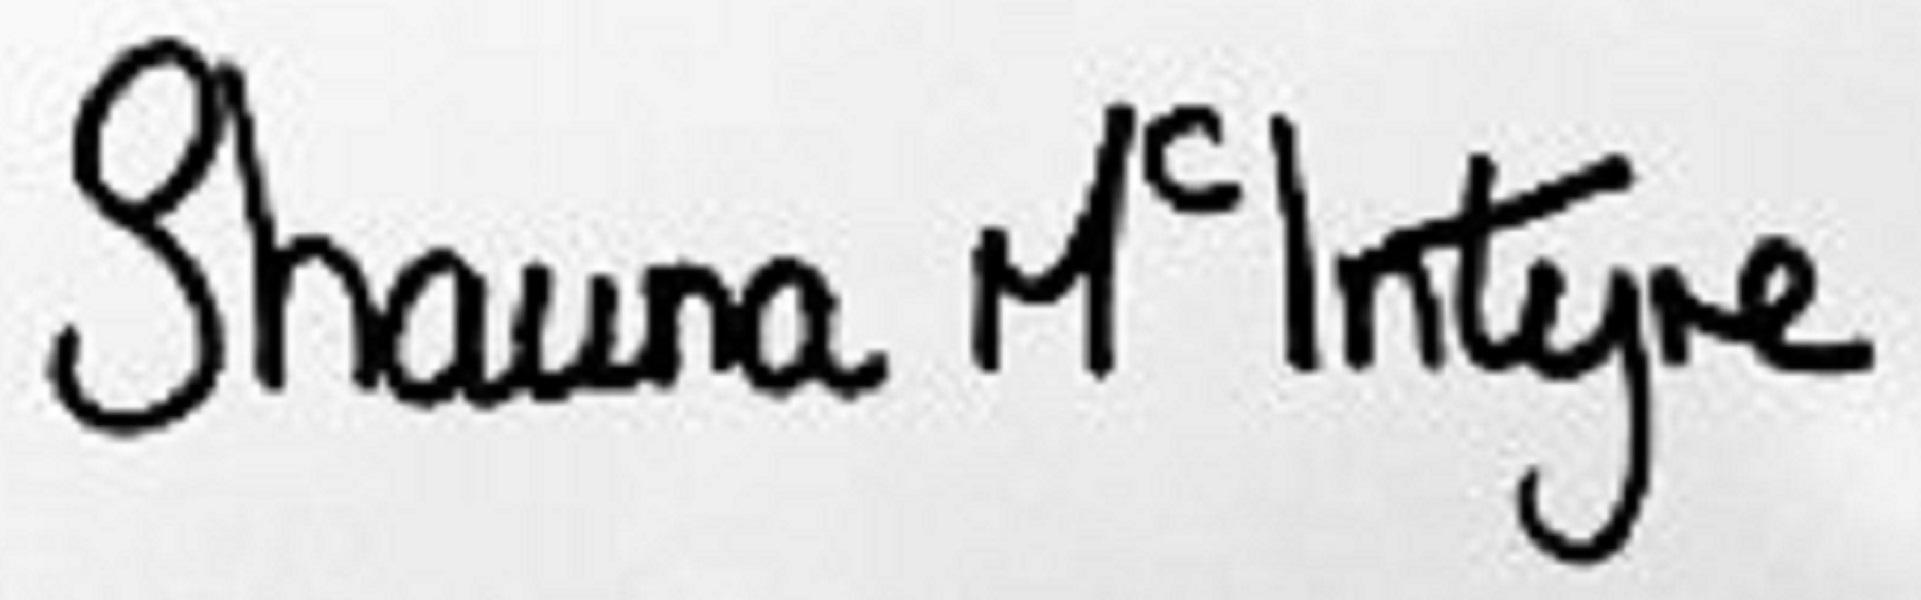 Shauna McIntyre Signature